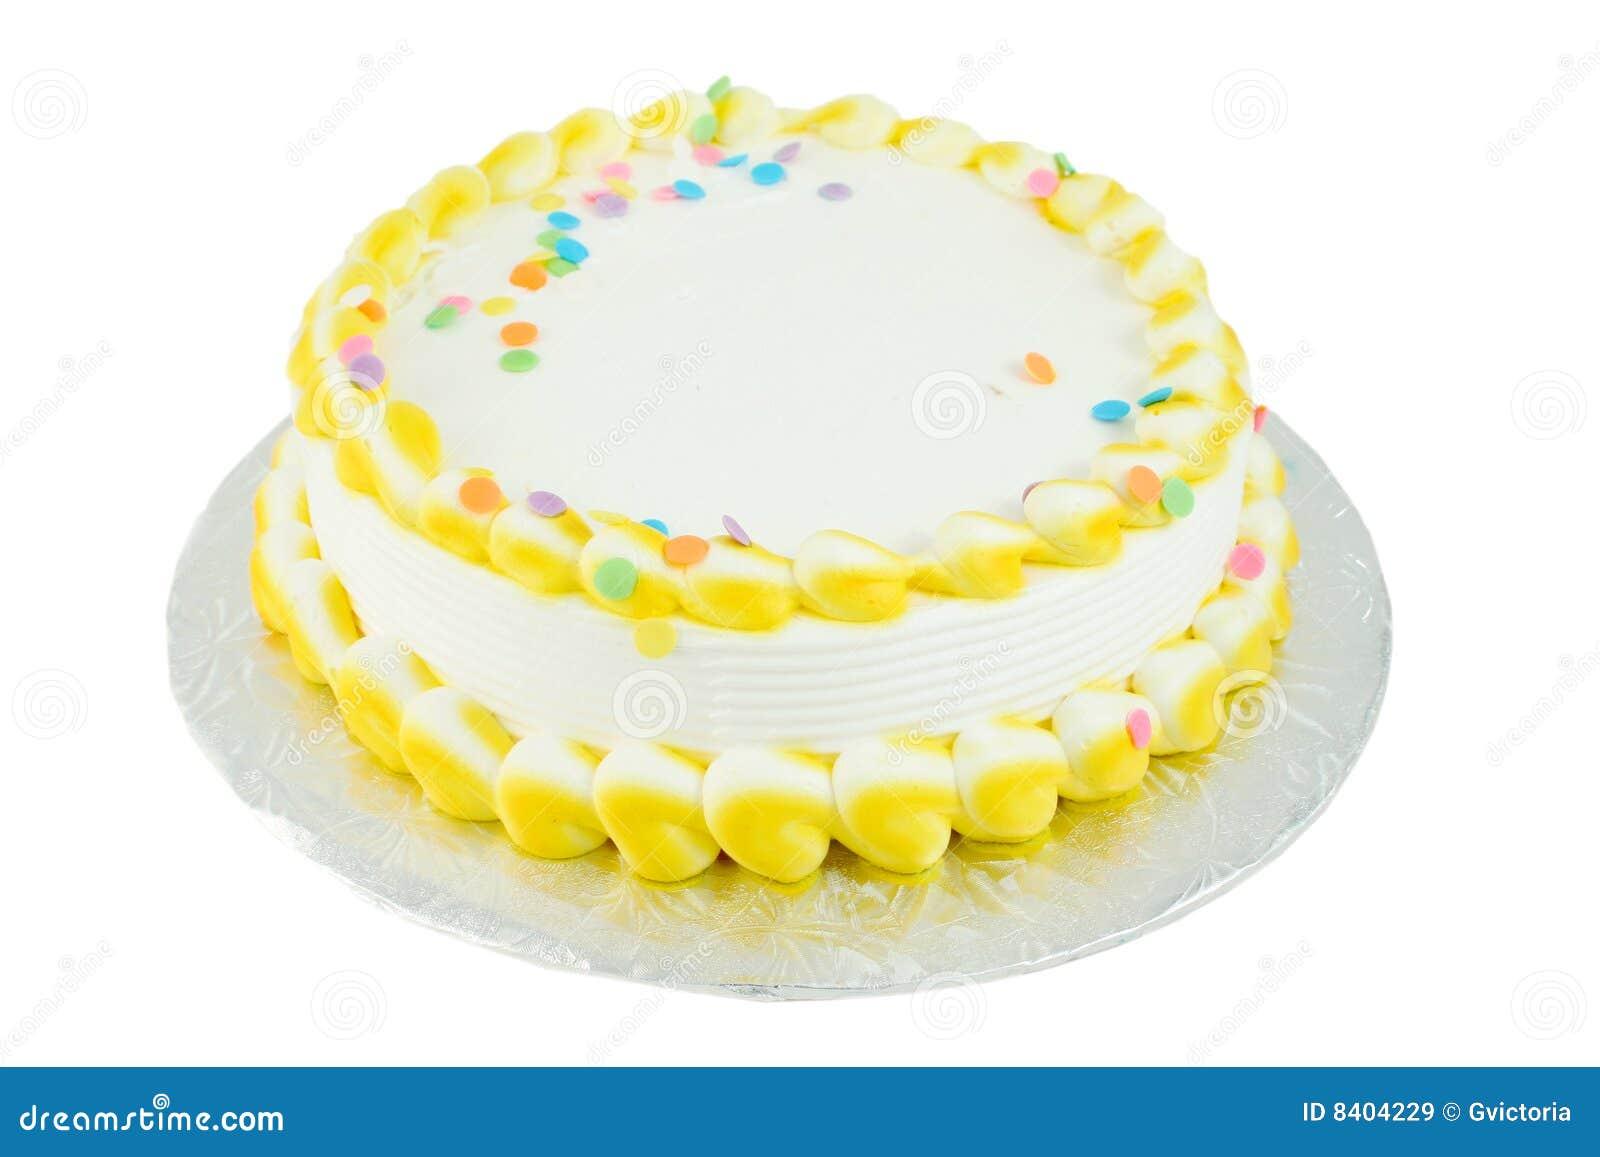 Birthday Cake Images Blank